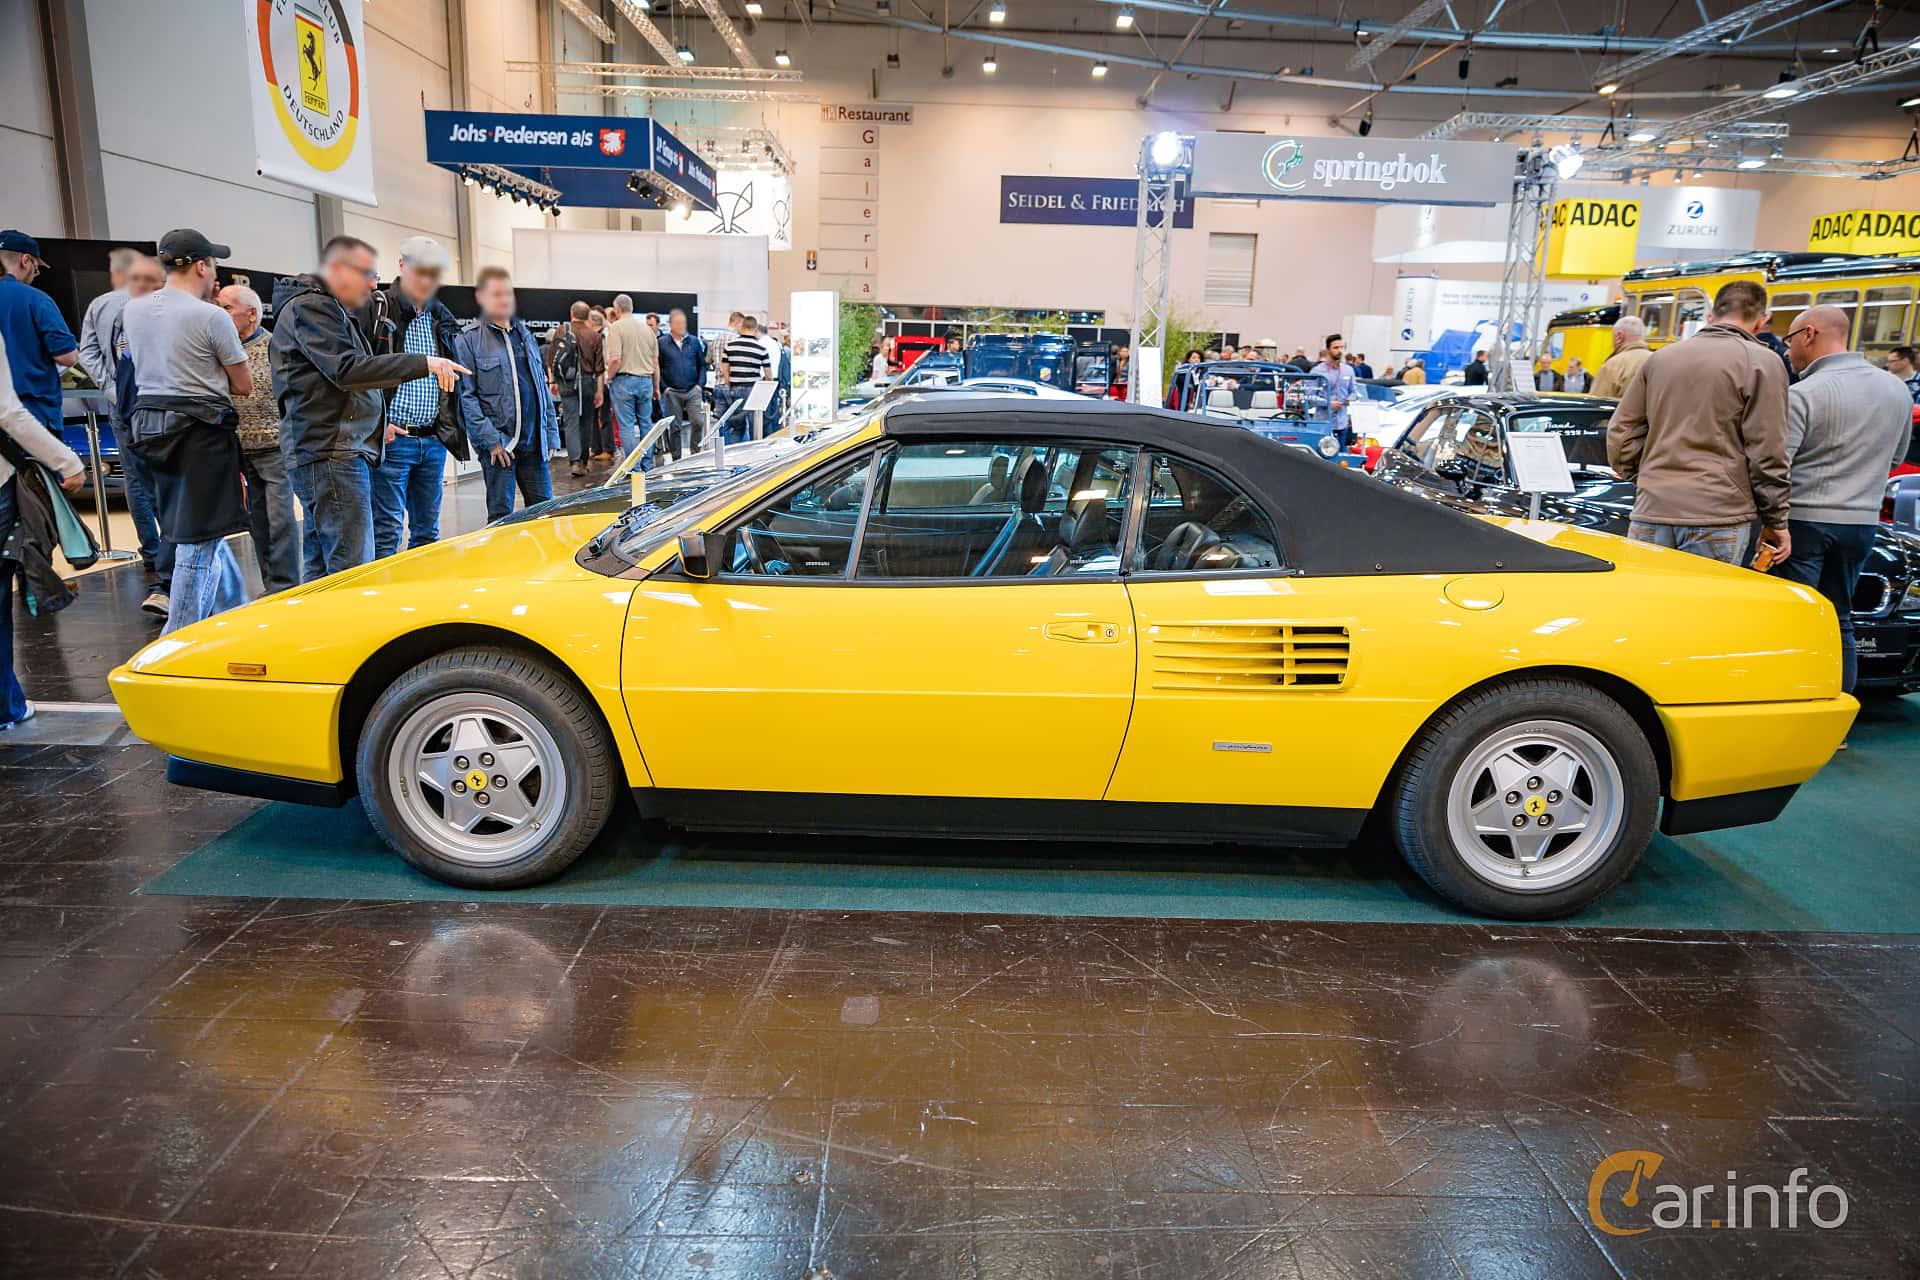 ferrari-mondial-cabriolet-side-techno-classica-essen-2016-1-214106 Extraordinary Ferrari Mondial 3.4 T Review Cars Trend